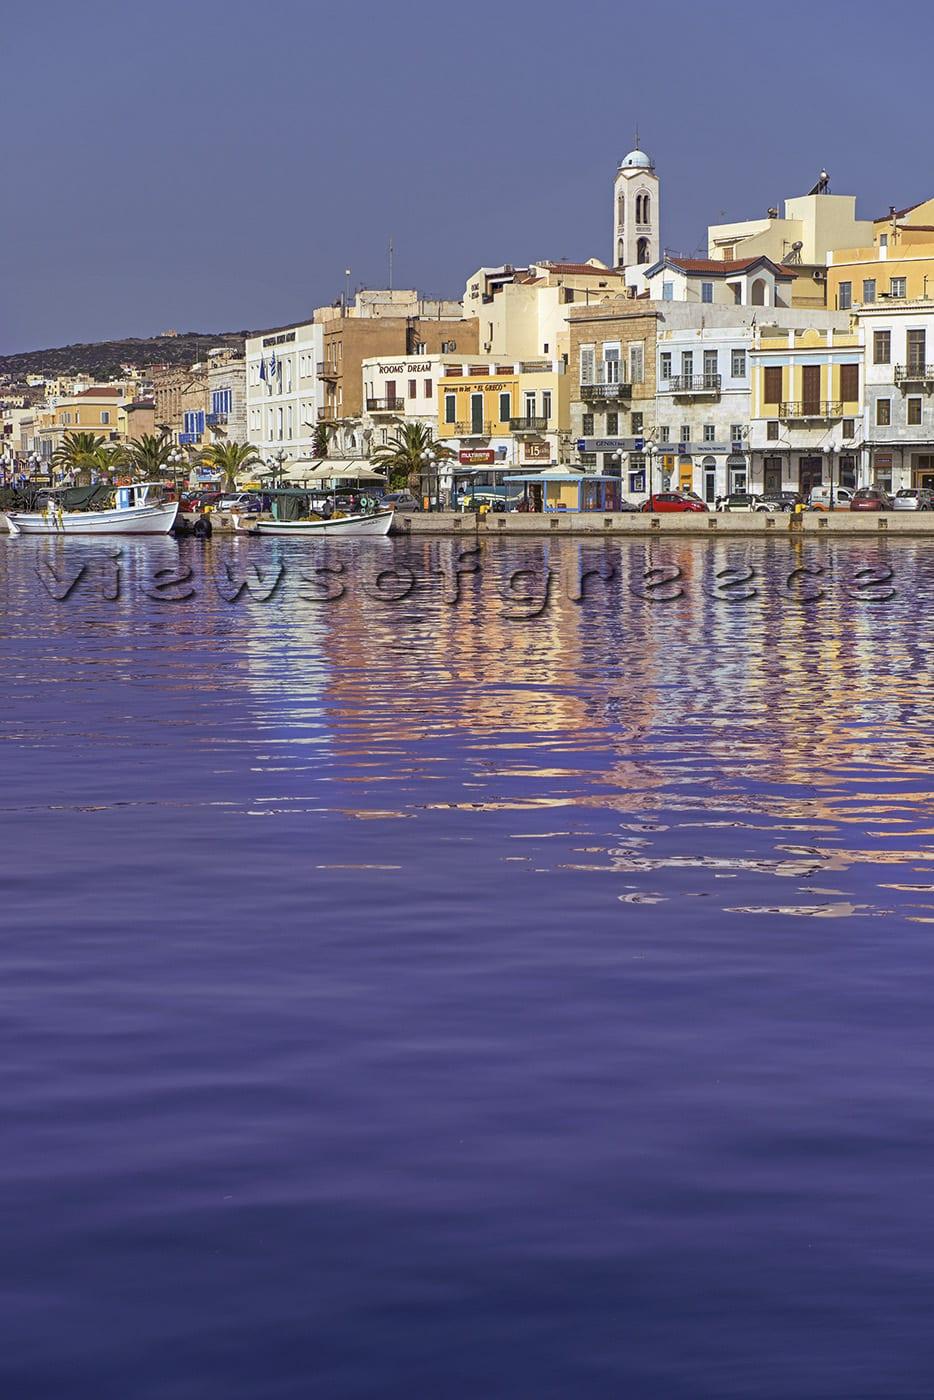 greece, syros, cyclades, aegean, island, greek, ermoupoli, architecture, siros, catholic, atmospheric, Ermoupoli, Ano Syros, Σύρος, Ερμούπολη, Βαμβακάρης, παραλίες, Άνω Μεριά